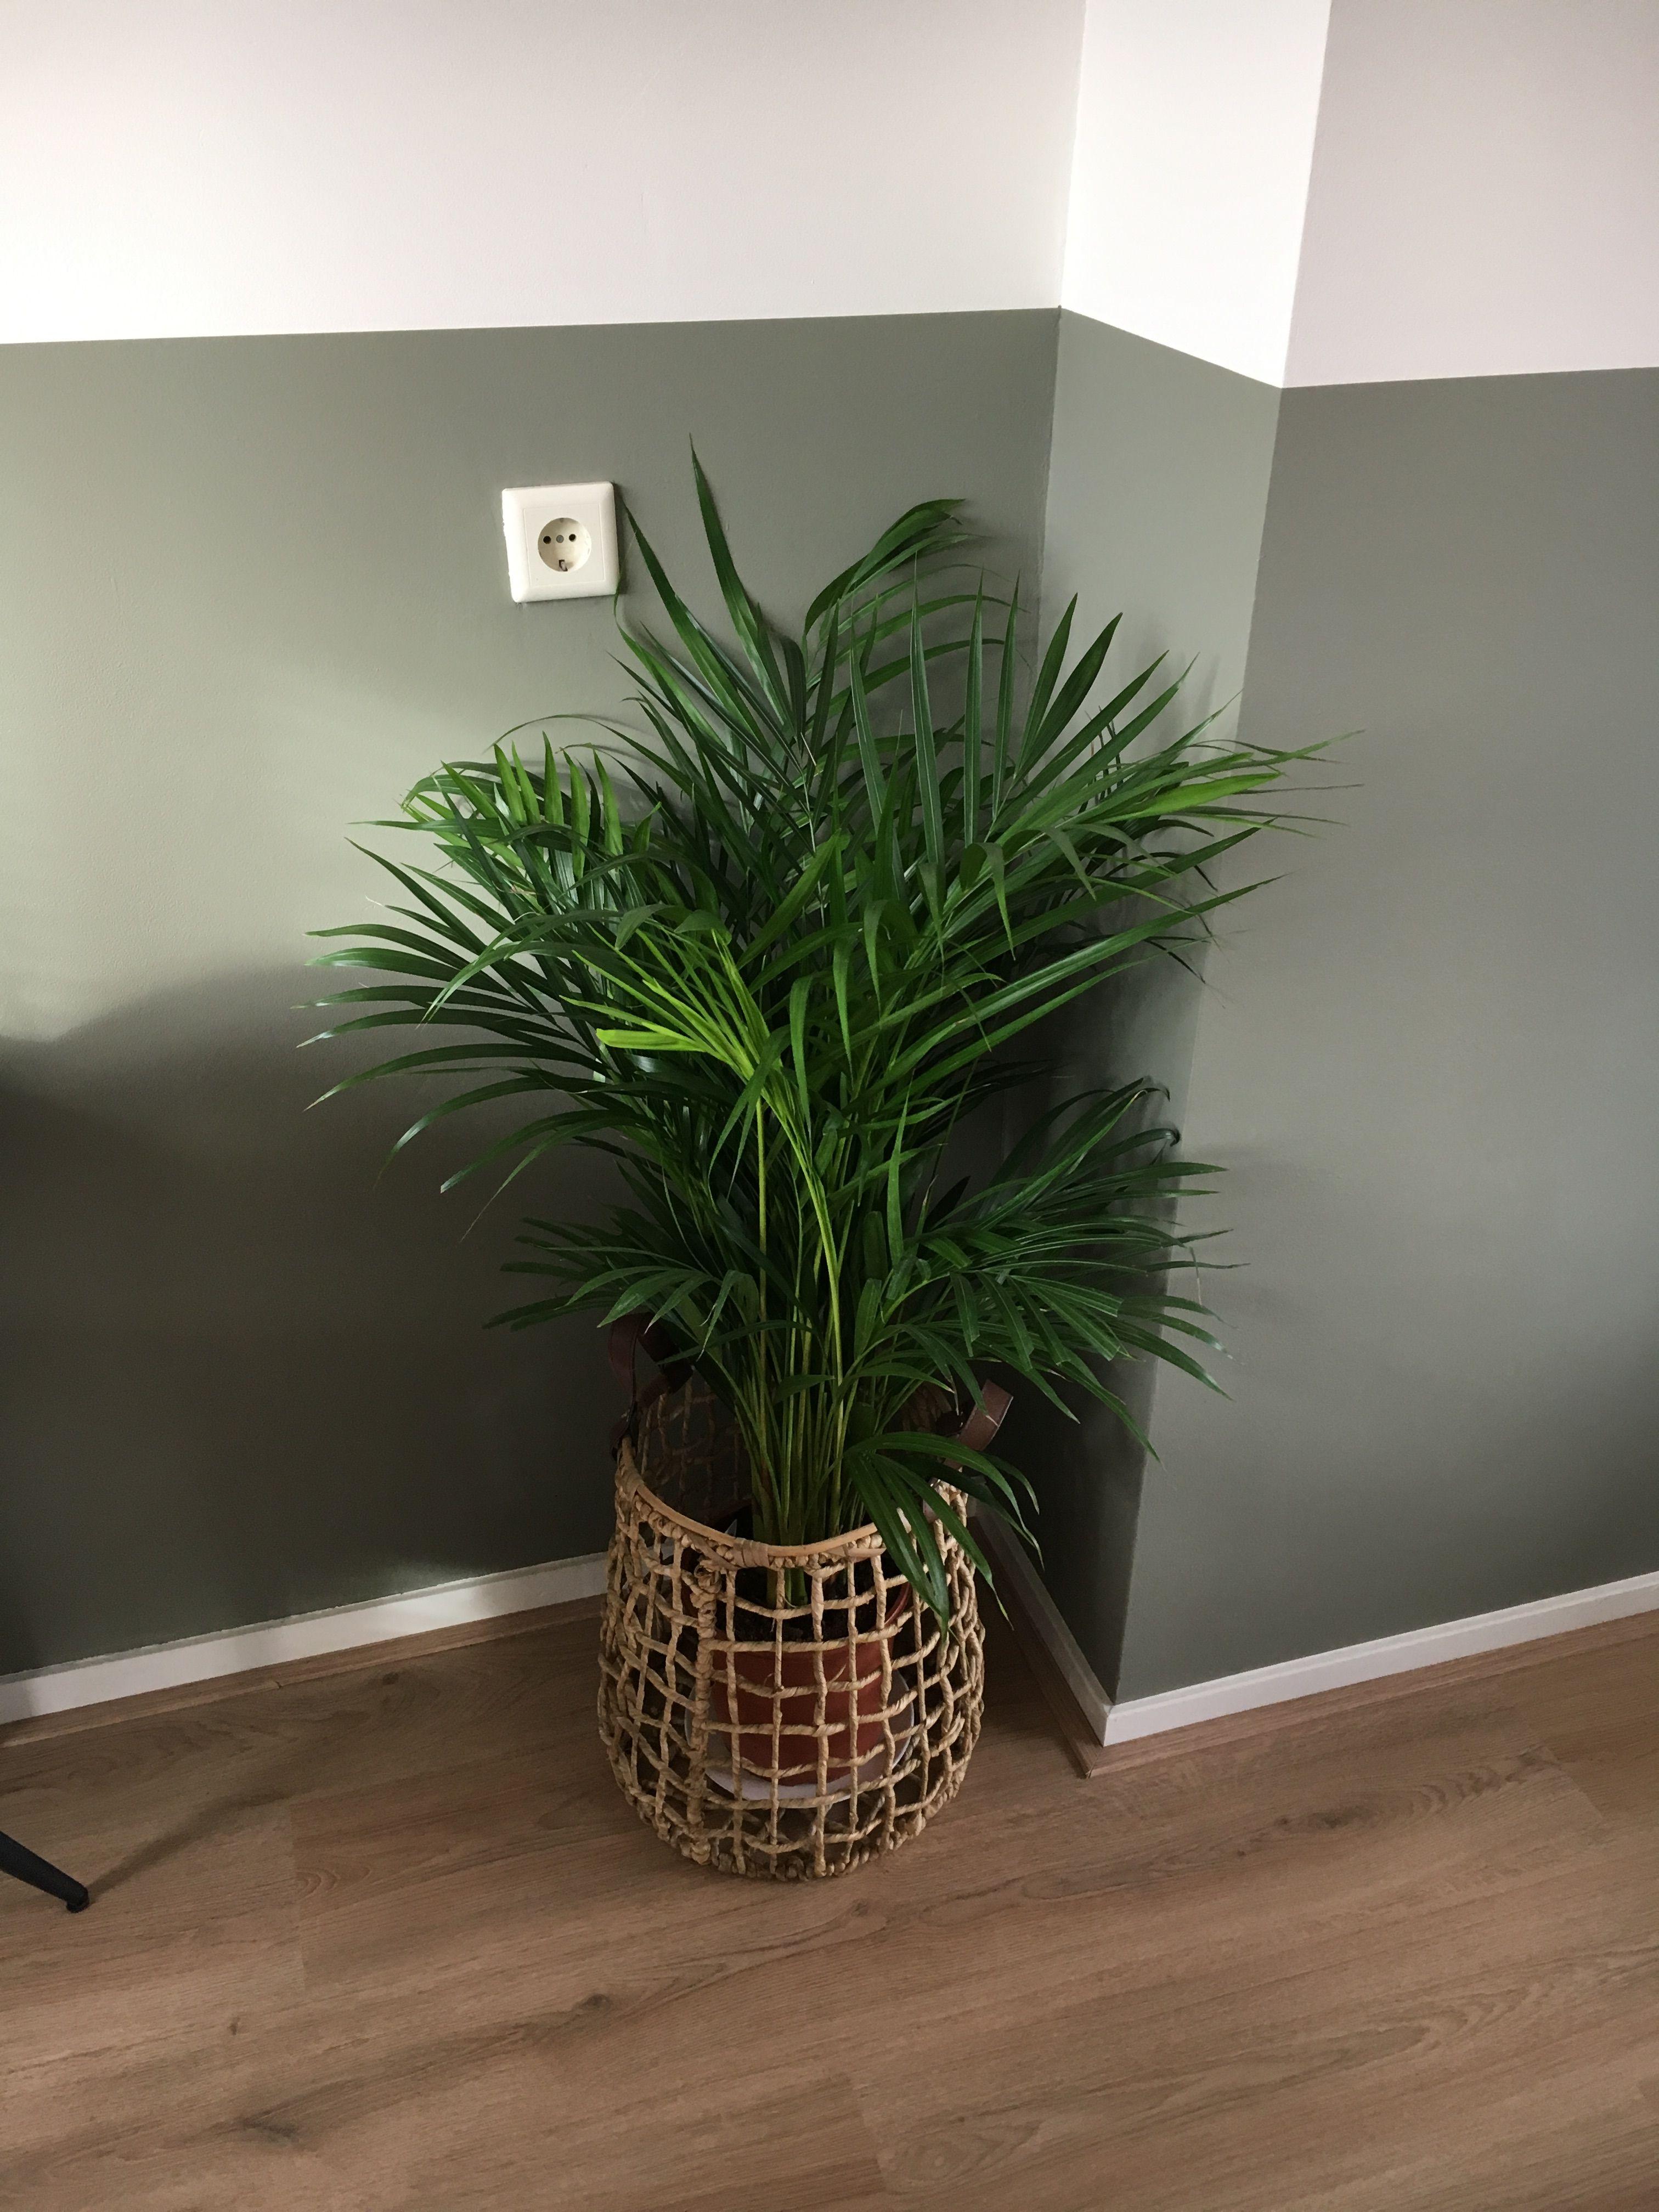 Photo of #groeninhuis #groenevingers #palm #lambrisering #canouflagegreen